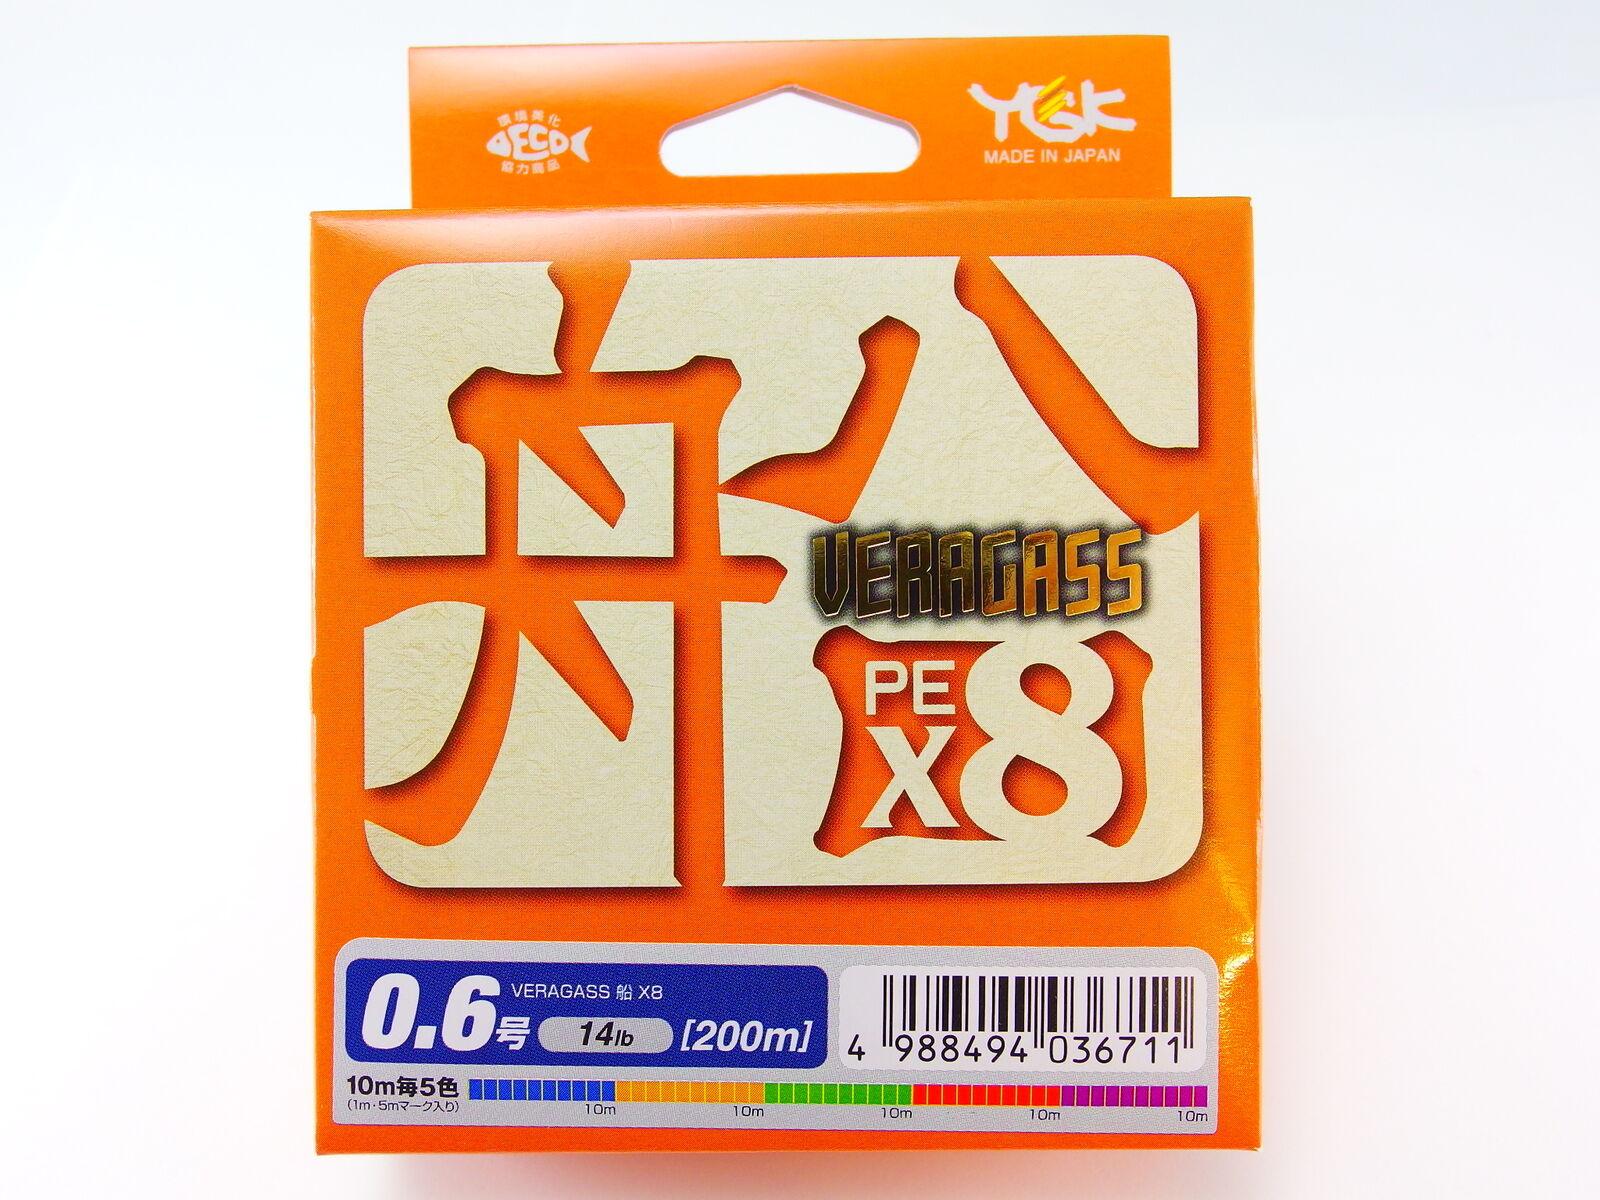 YGK - VARAGASS FUNE (BOAT) PE X8 Hi-Quality  WX Dyneema 200m lb  be in great demand